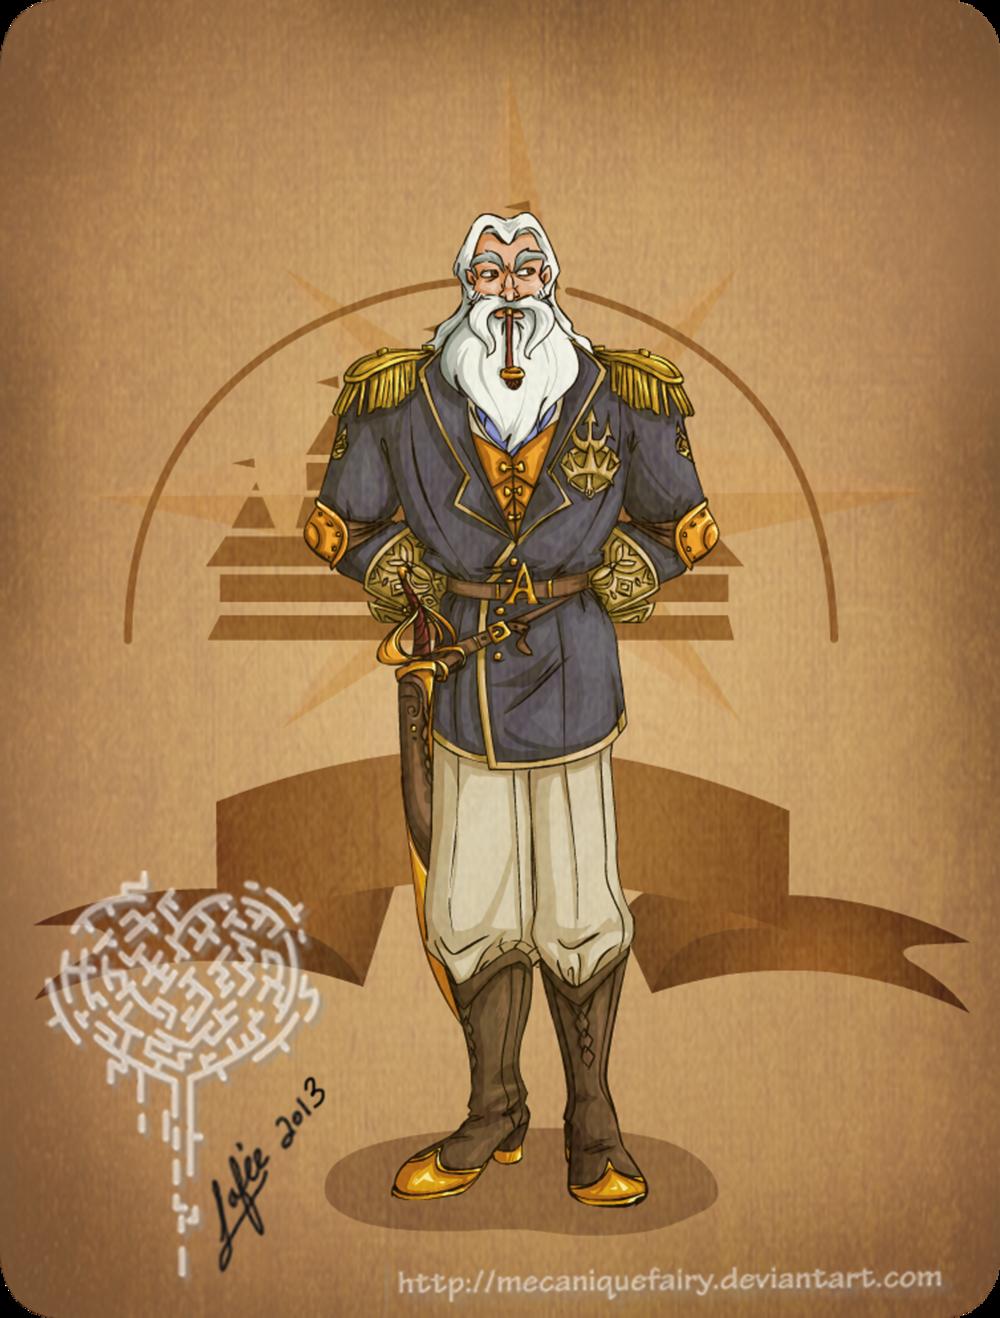 disney_steampunk__king_triton_by_mecaniquefairy-d5xnjk5.png